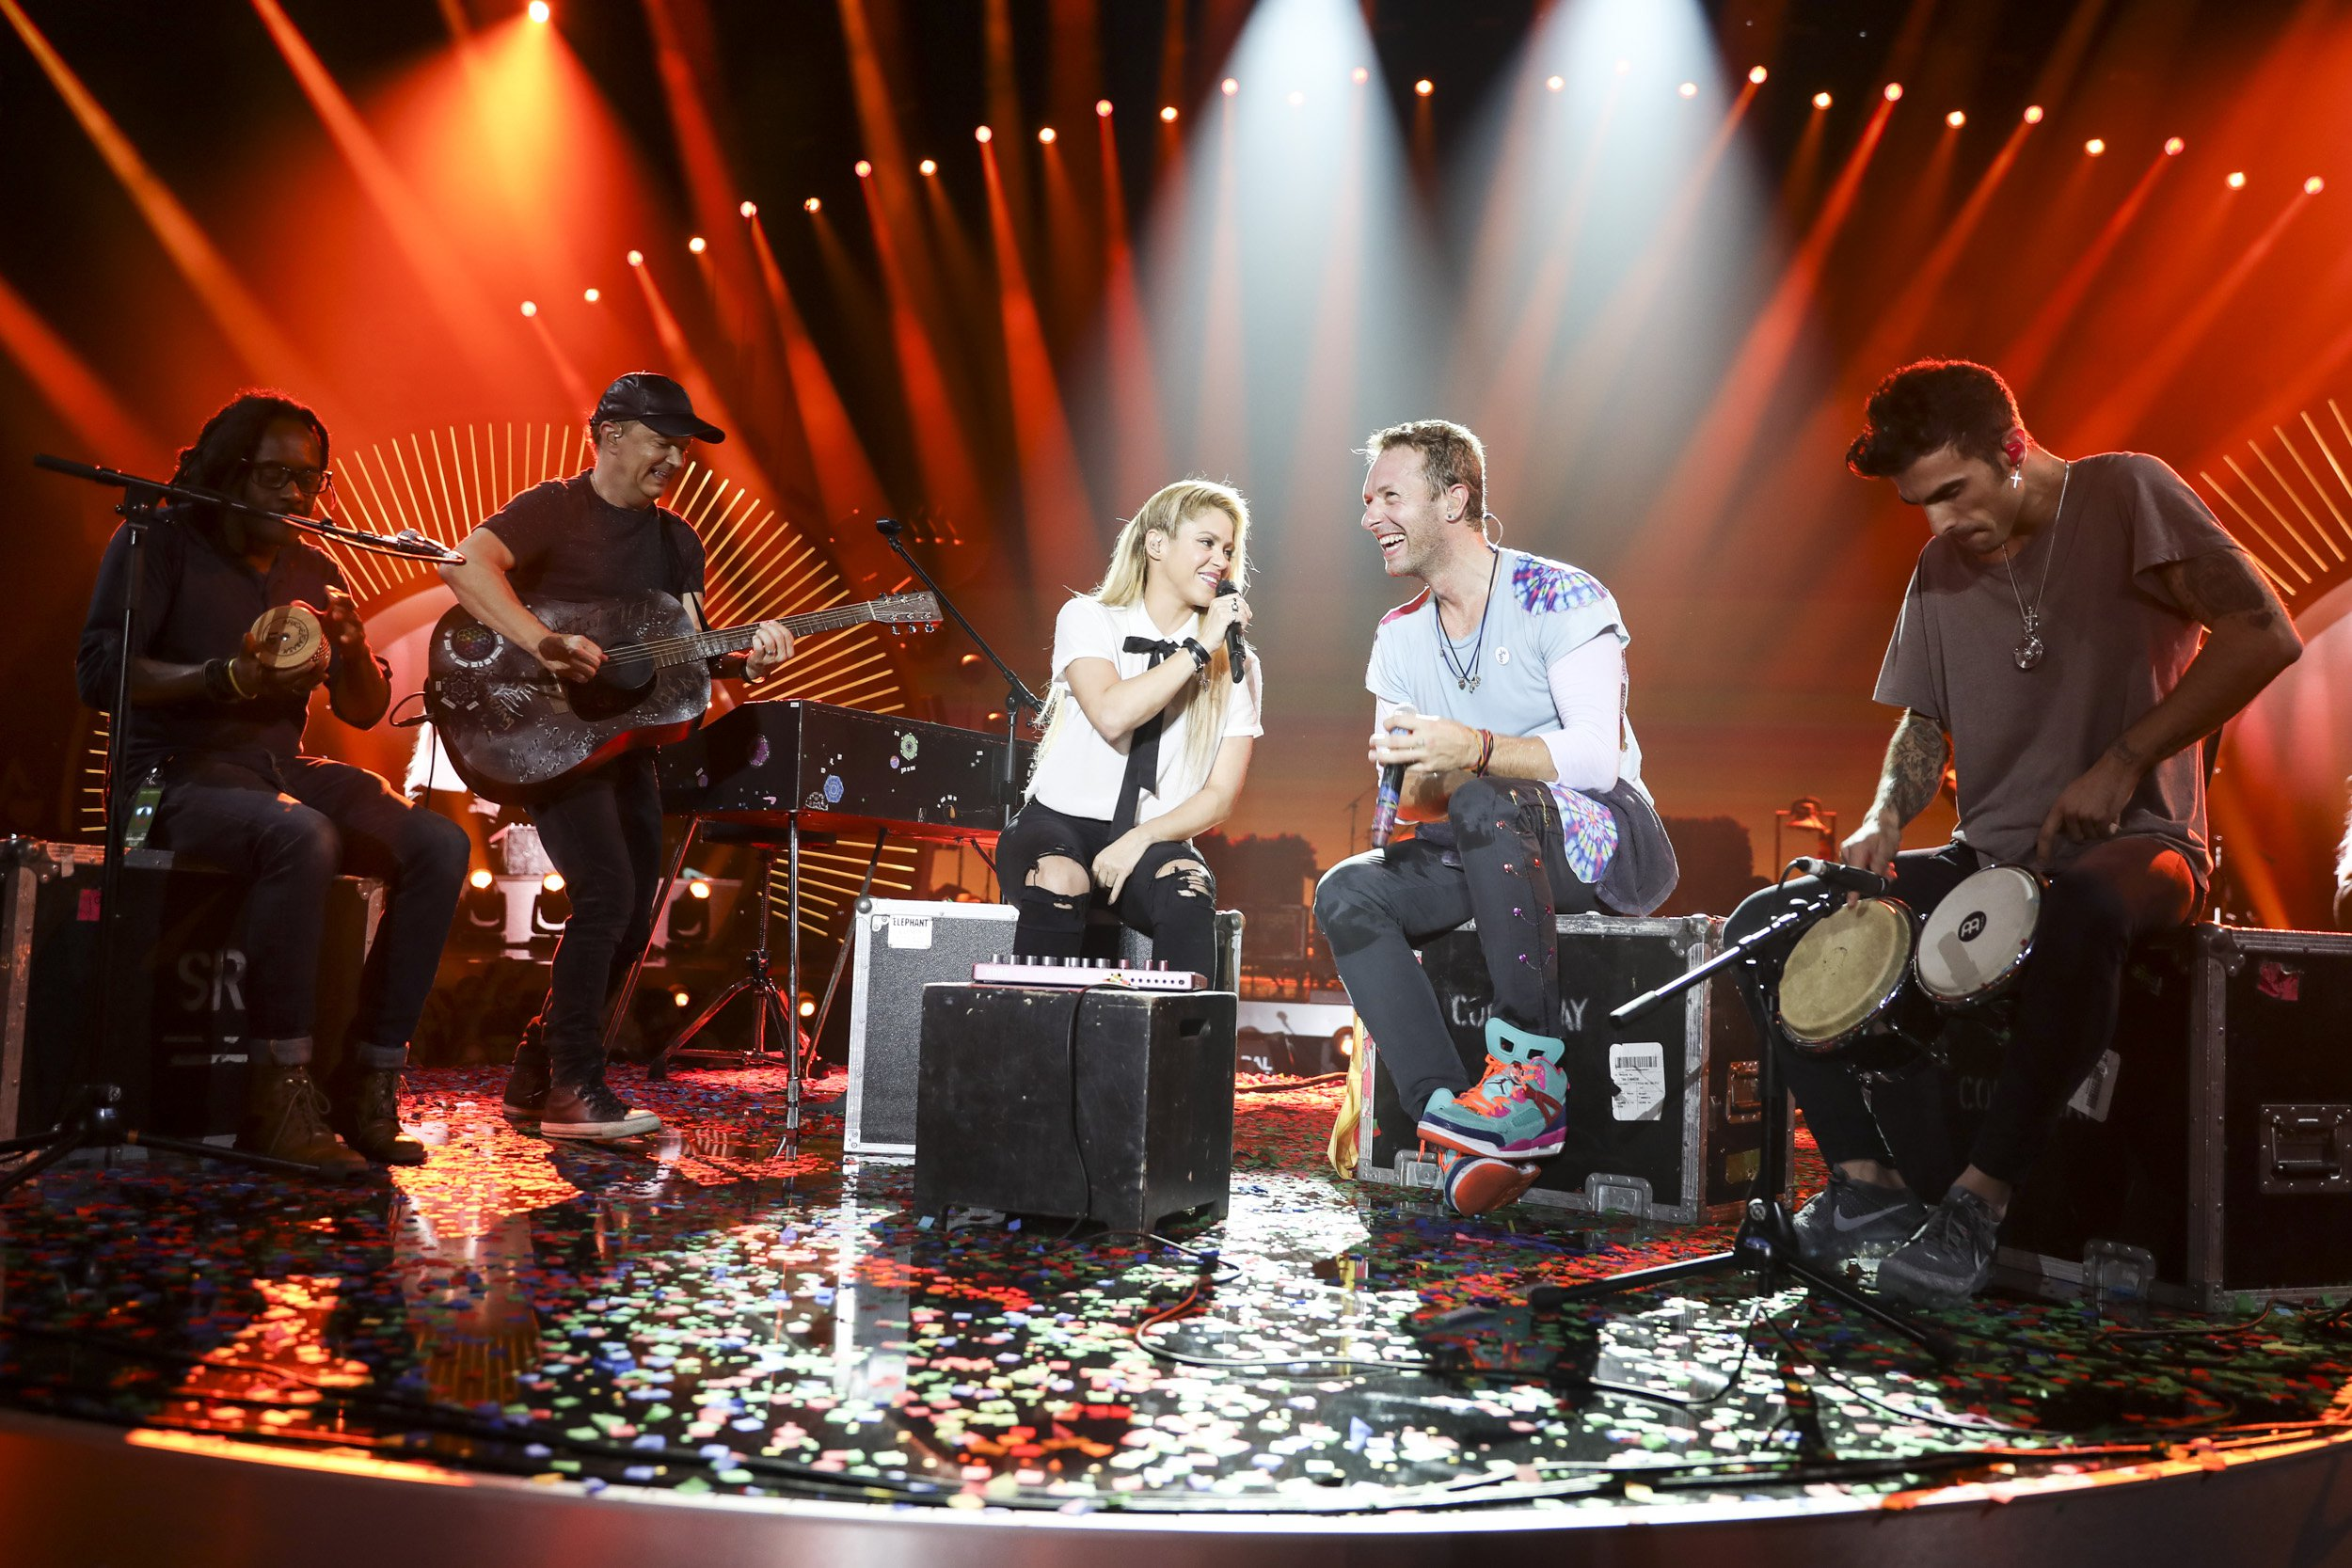 Hamburg_Coldplay_Shakira_GreyHuttonForGlobalCitizen_3.jpg